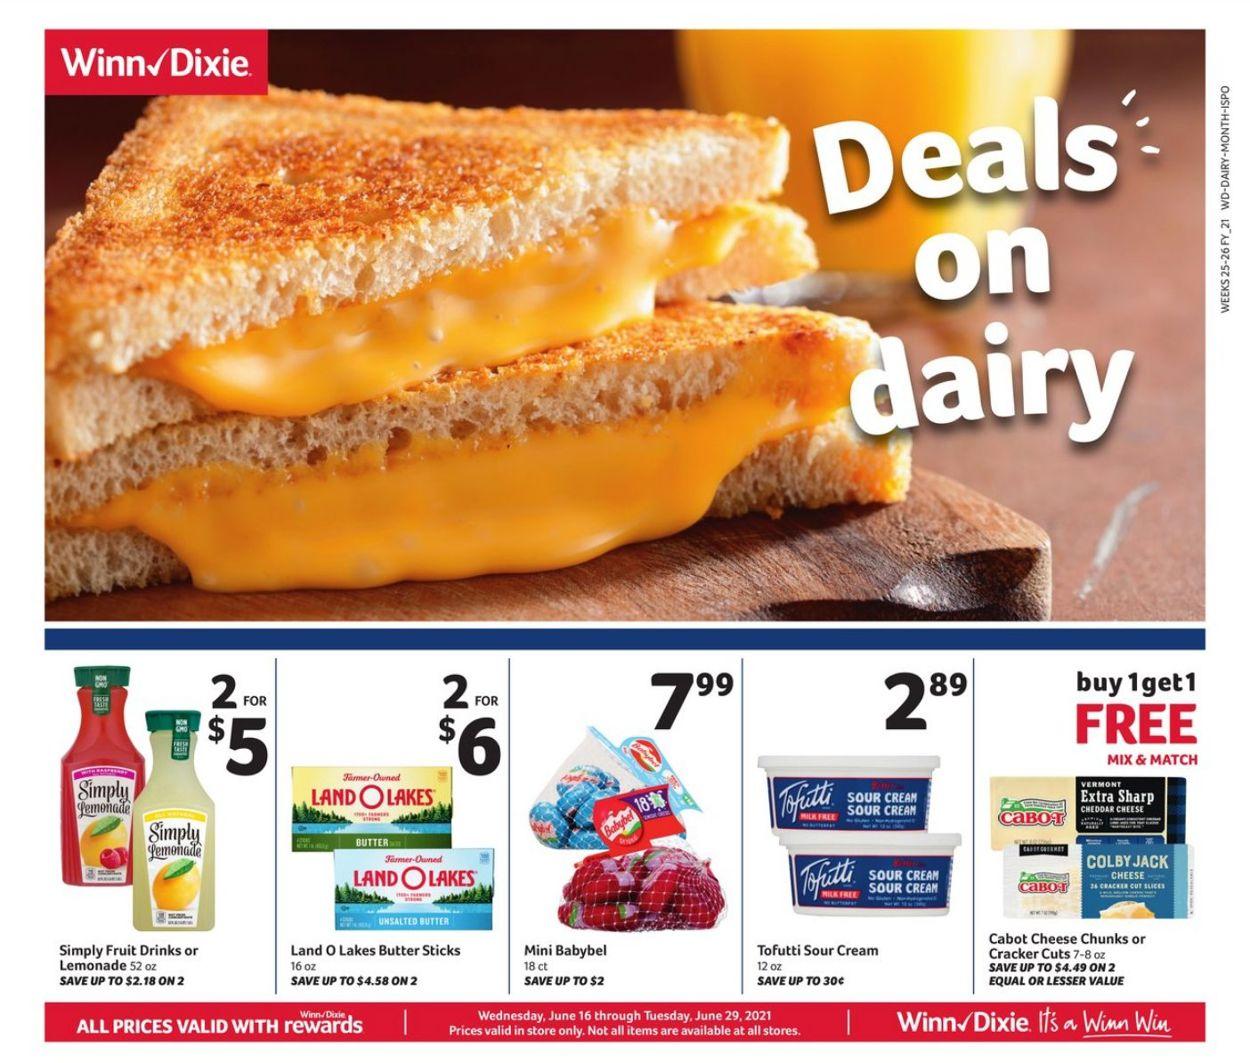 Winn Dixie Weekly Ad Circular - valid 06/16-06/29/2021